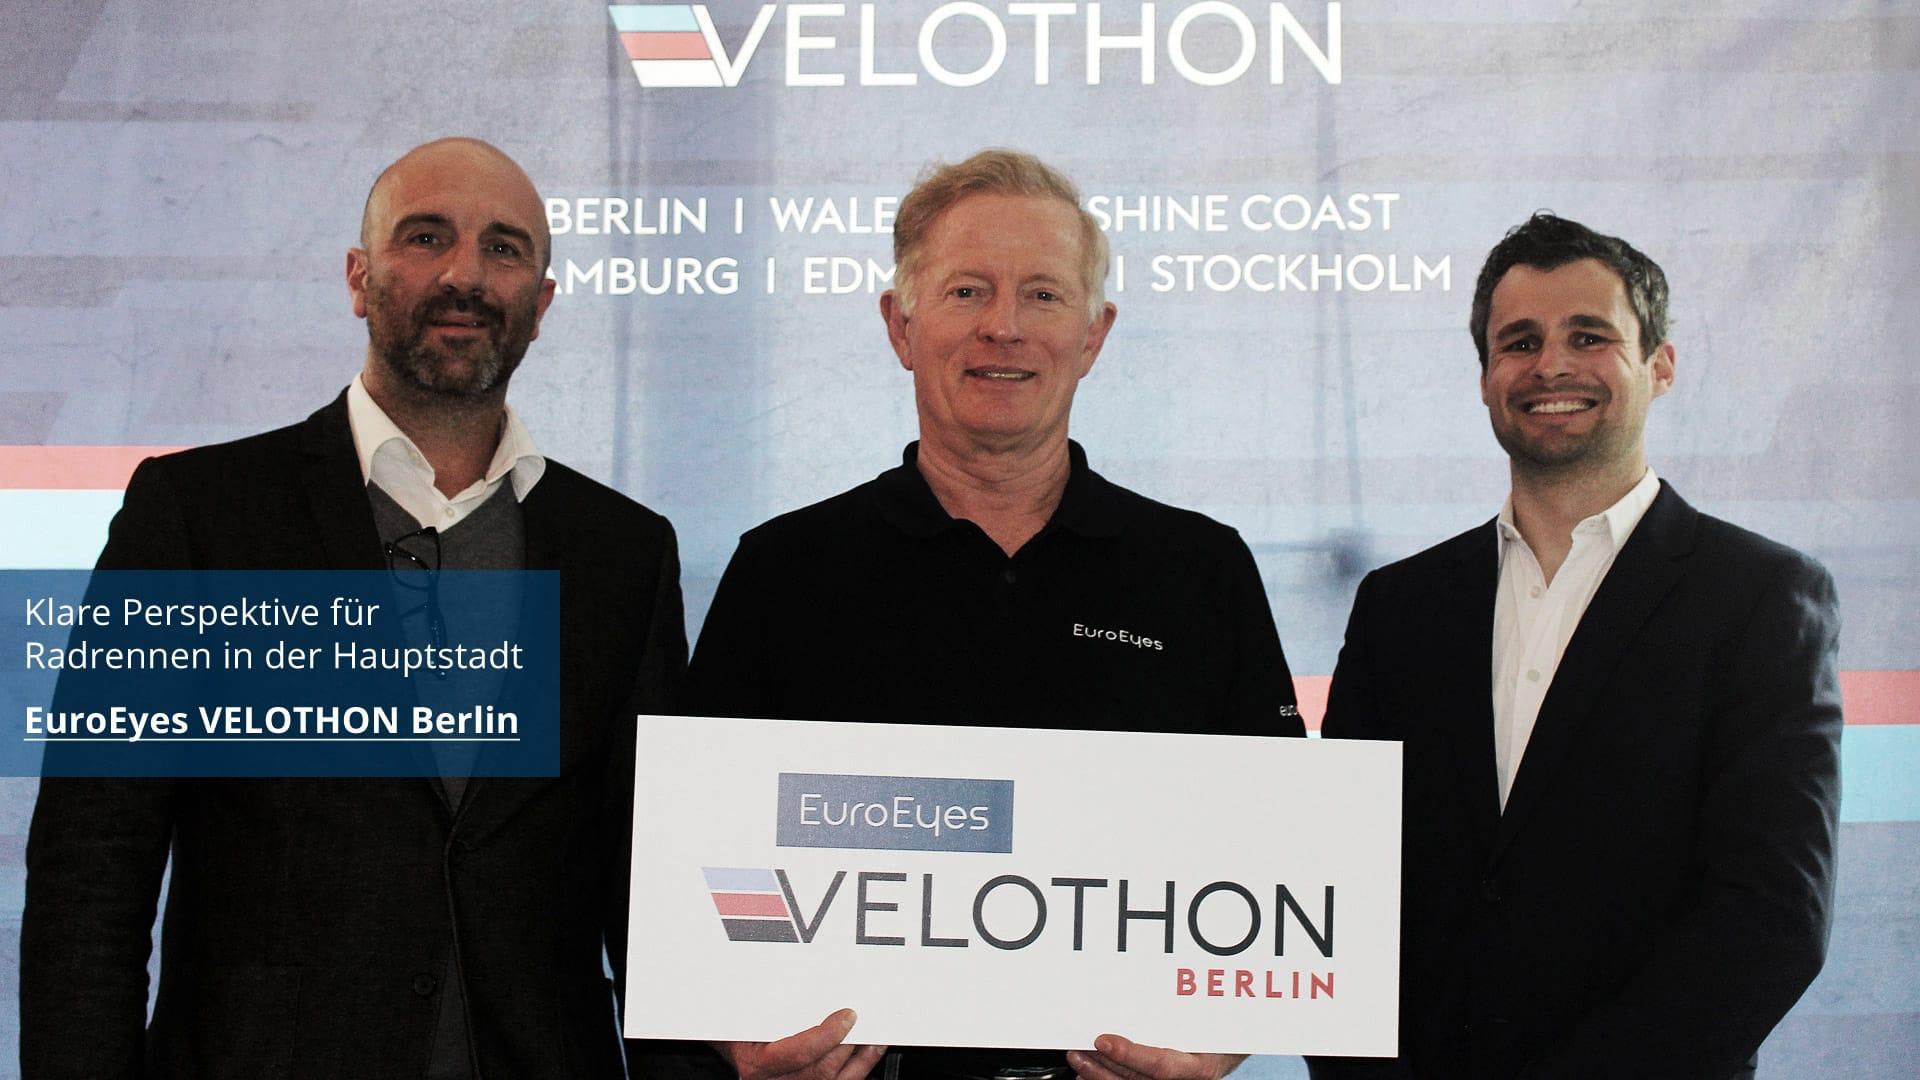 velothon